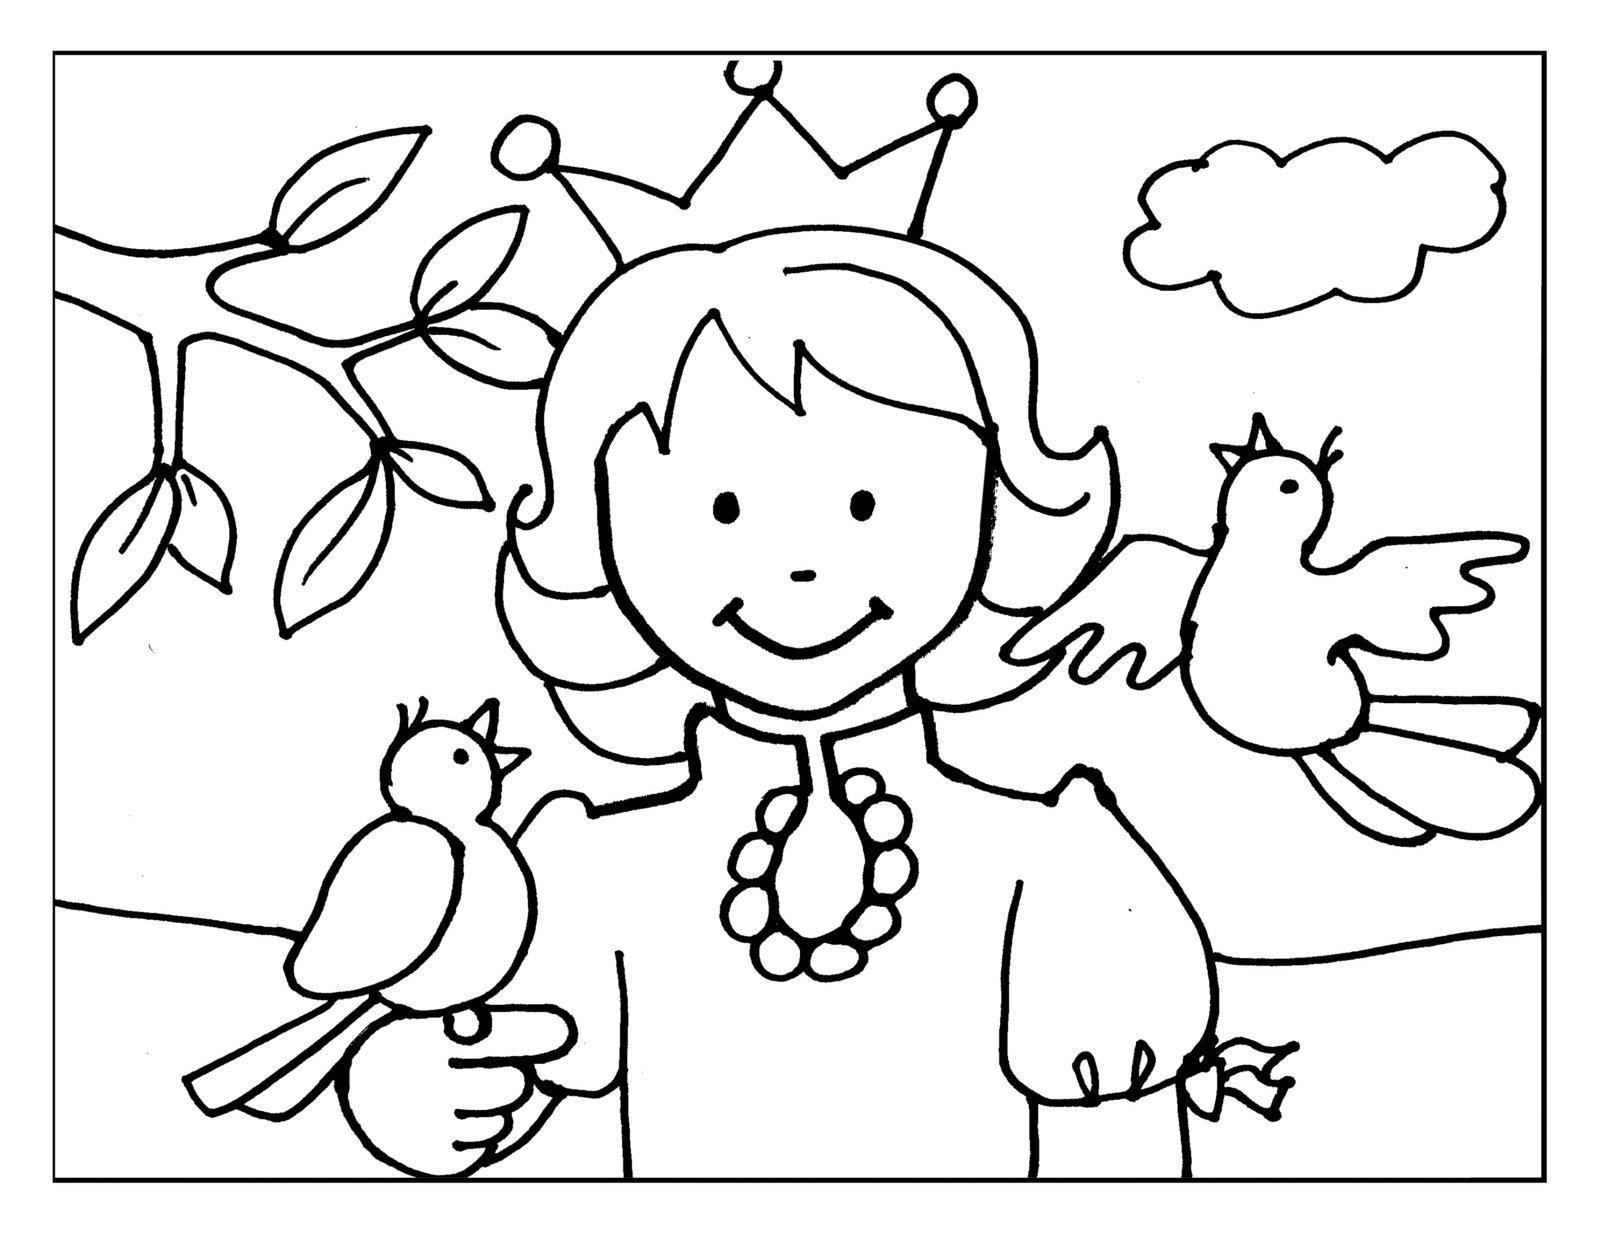 10 Dibujos Para Colorear De Disney Princesas Bebes: Dibujos Para Colorear De Princesas Bebes Princesas Salle